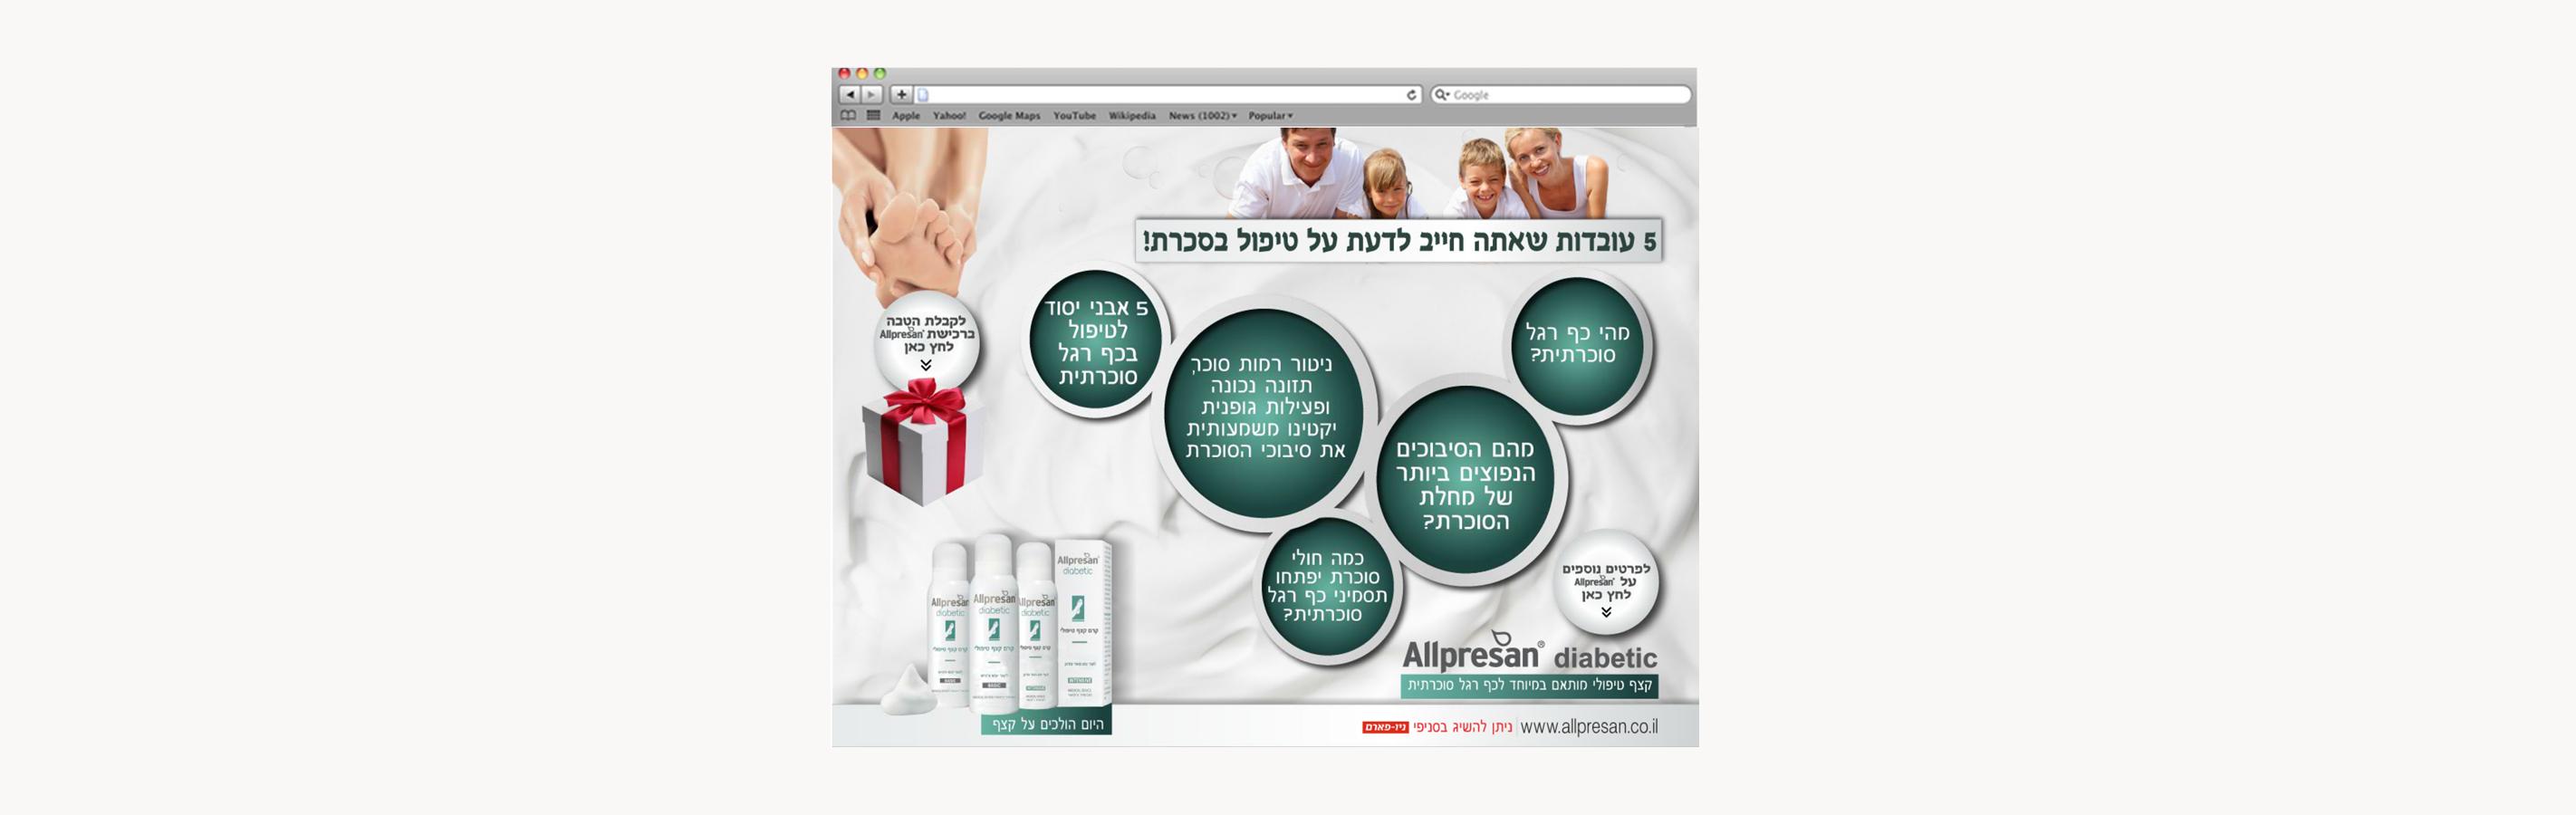 allpersan-mini site